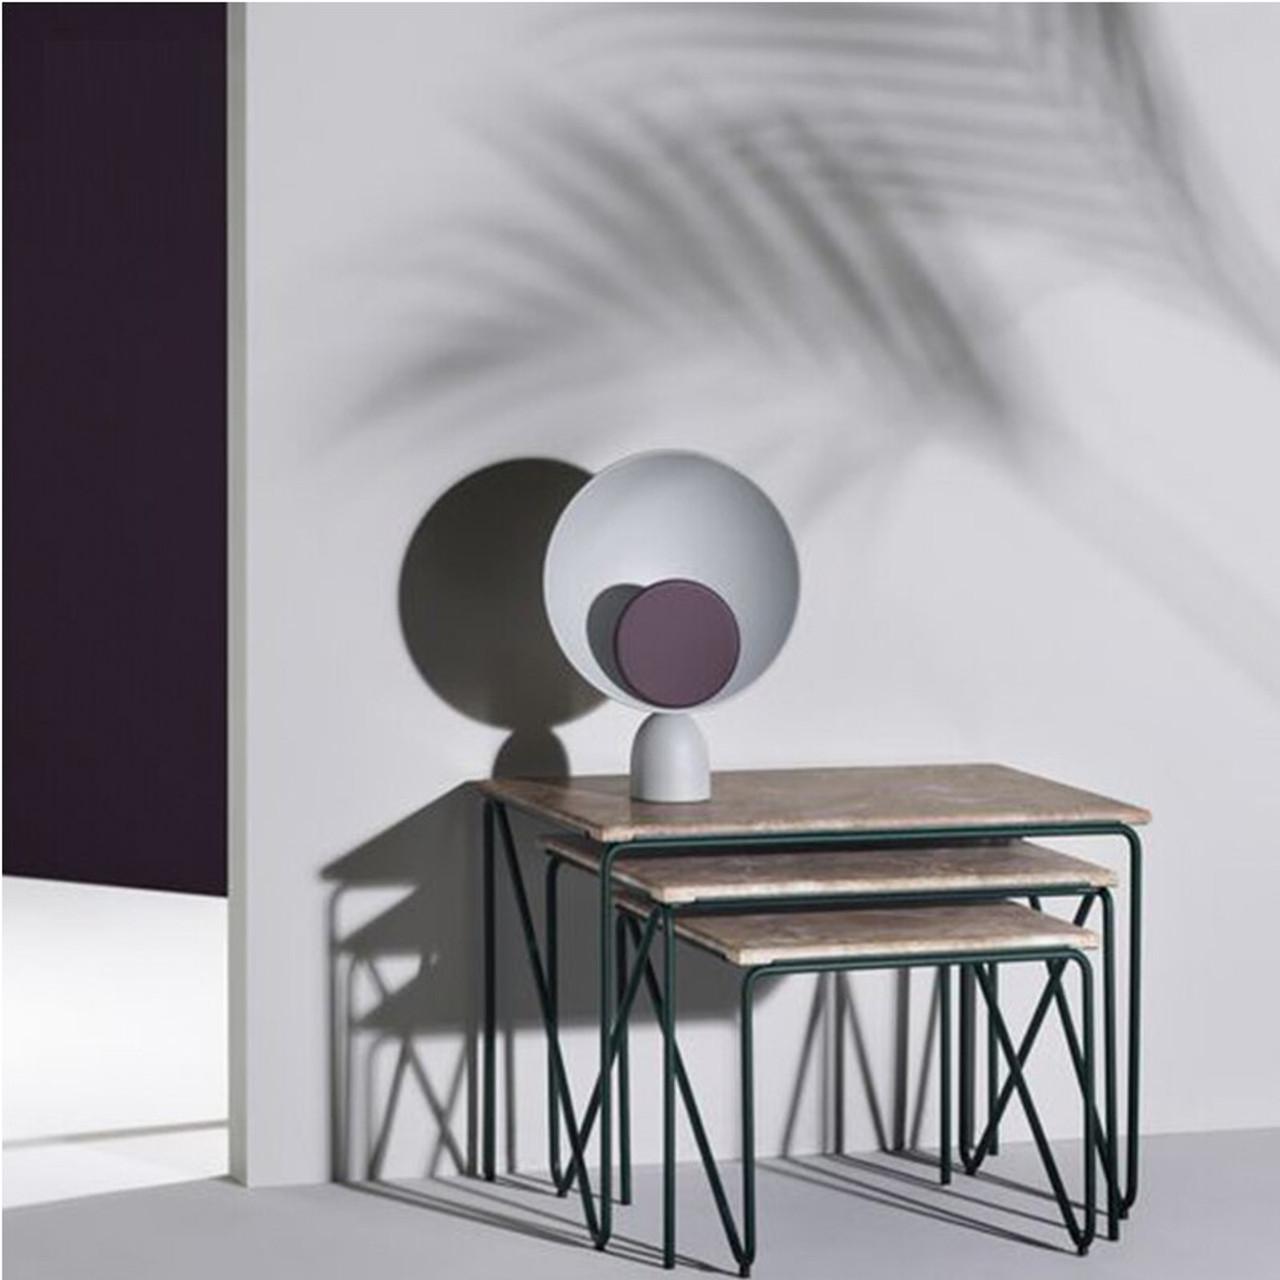 Modern Iron Dressing Led Table Lamps Bedroom Bedside Lights Study Reading Lighting Nordic Home Deco Desk Lamps Onshopdeals Com